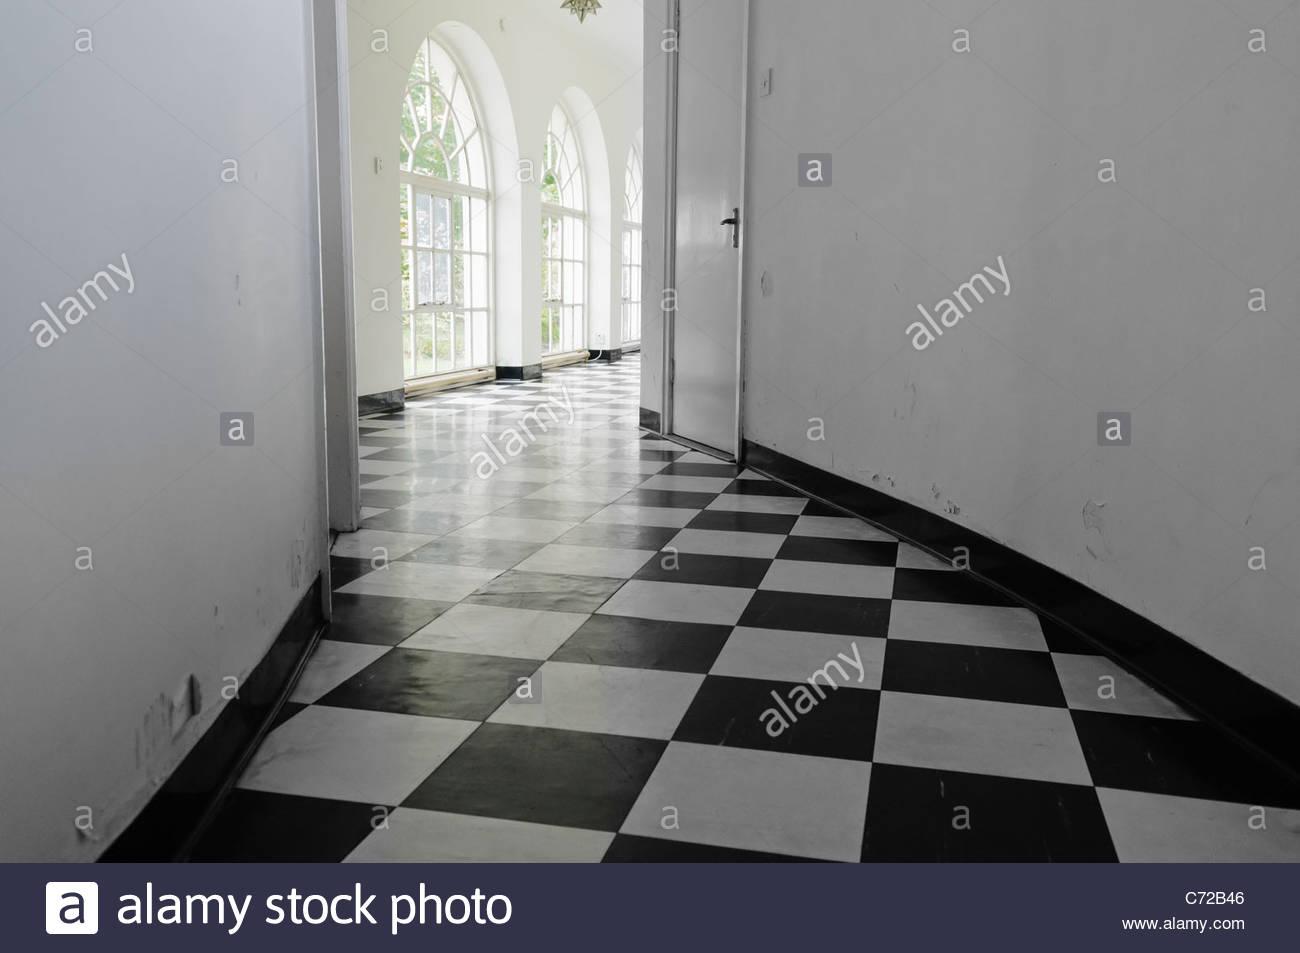 White art-deco hall with black and white floor tiles Stock Photo ...